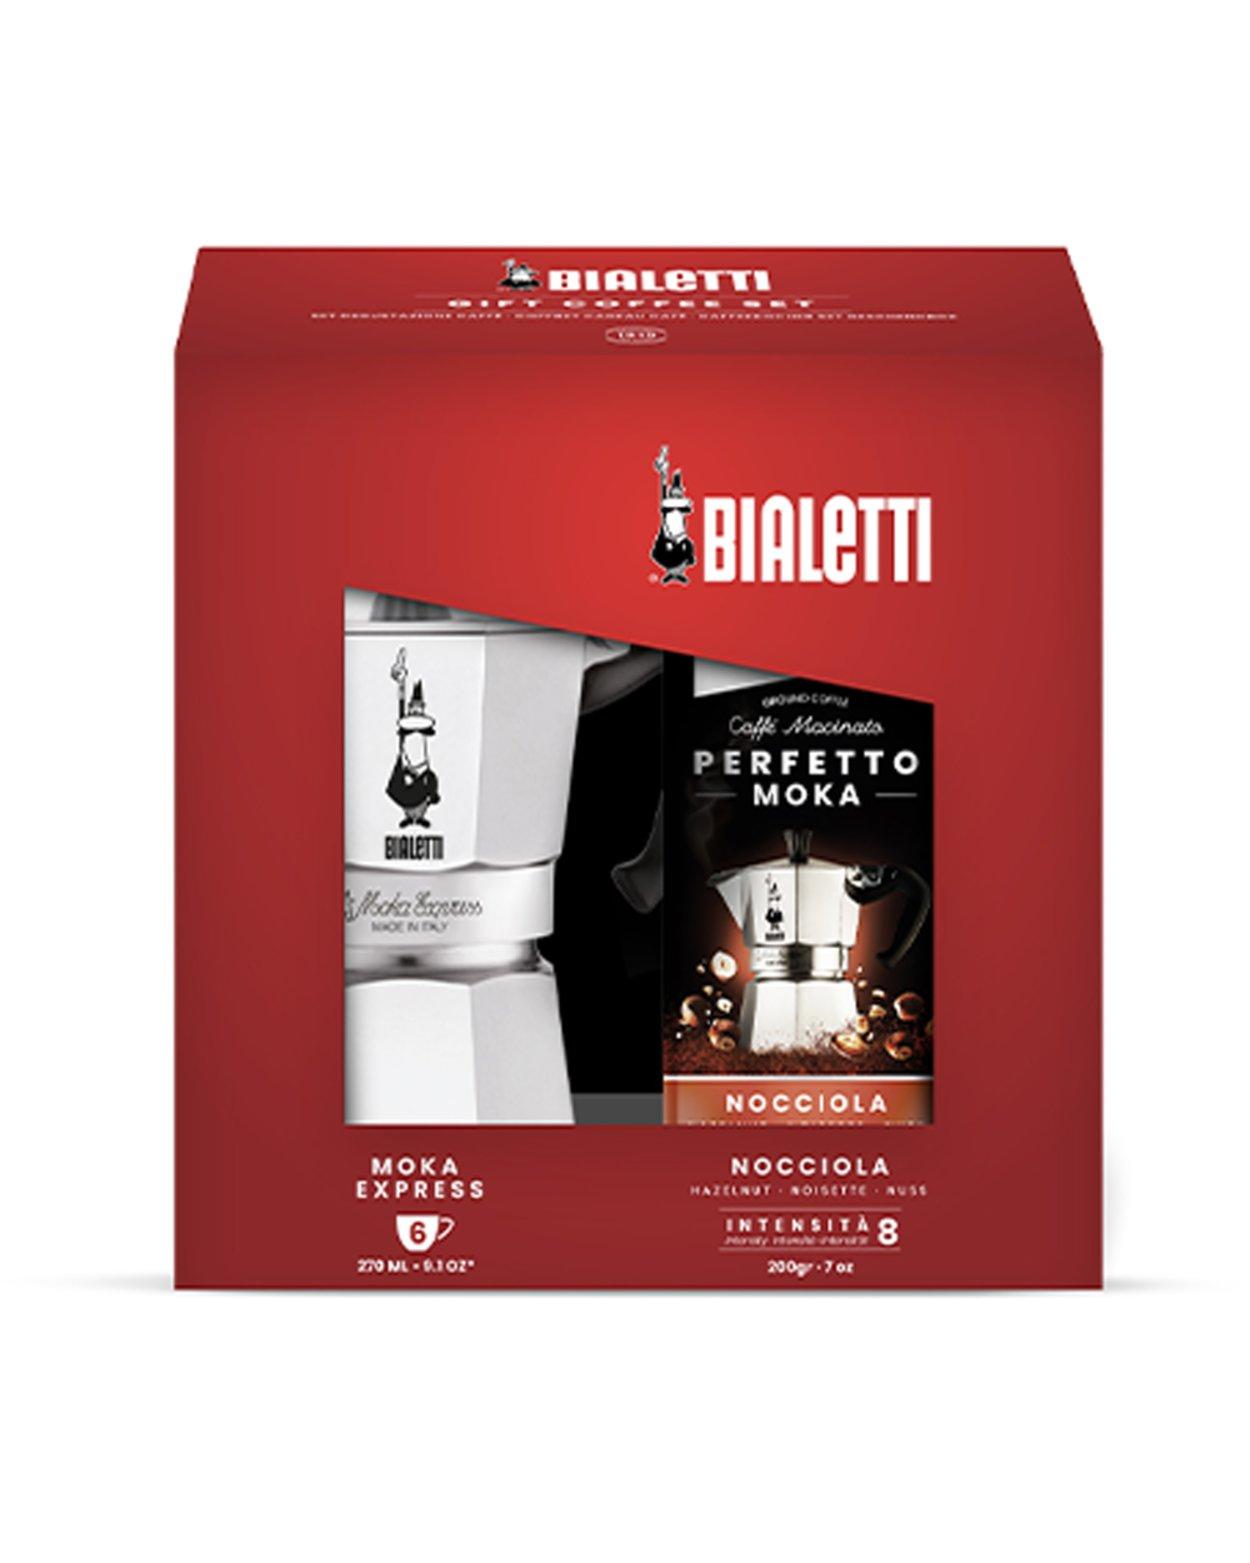 6 Cup Moka Express & Coffee Gift Set